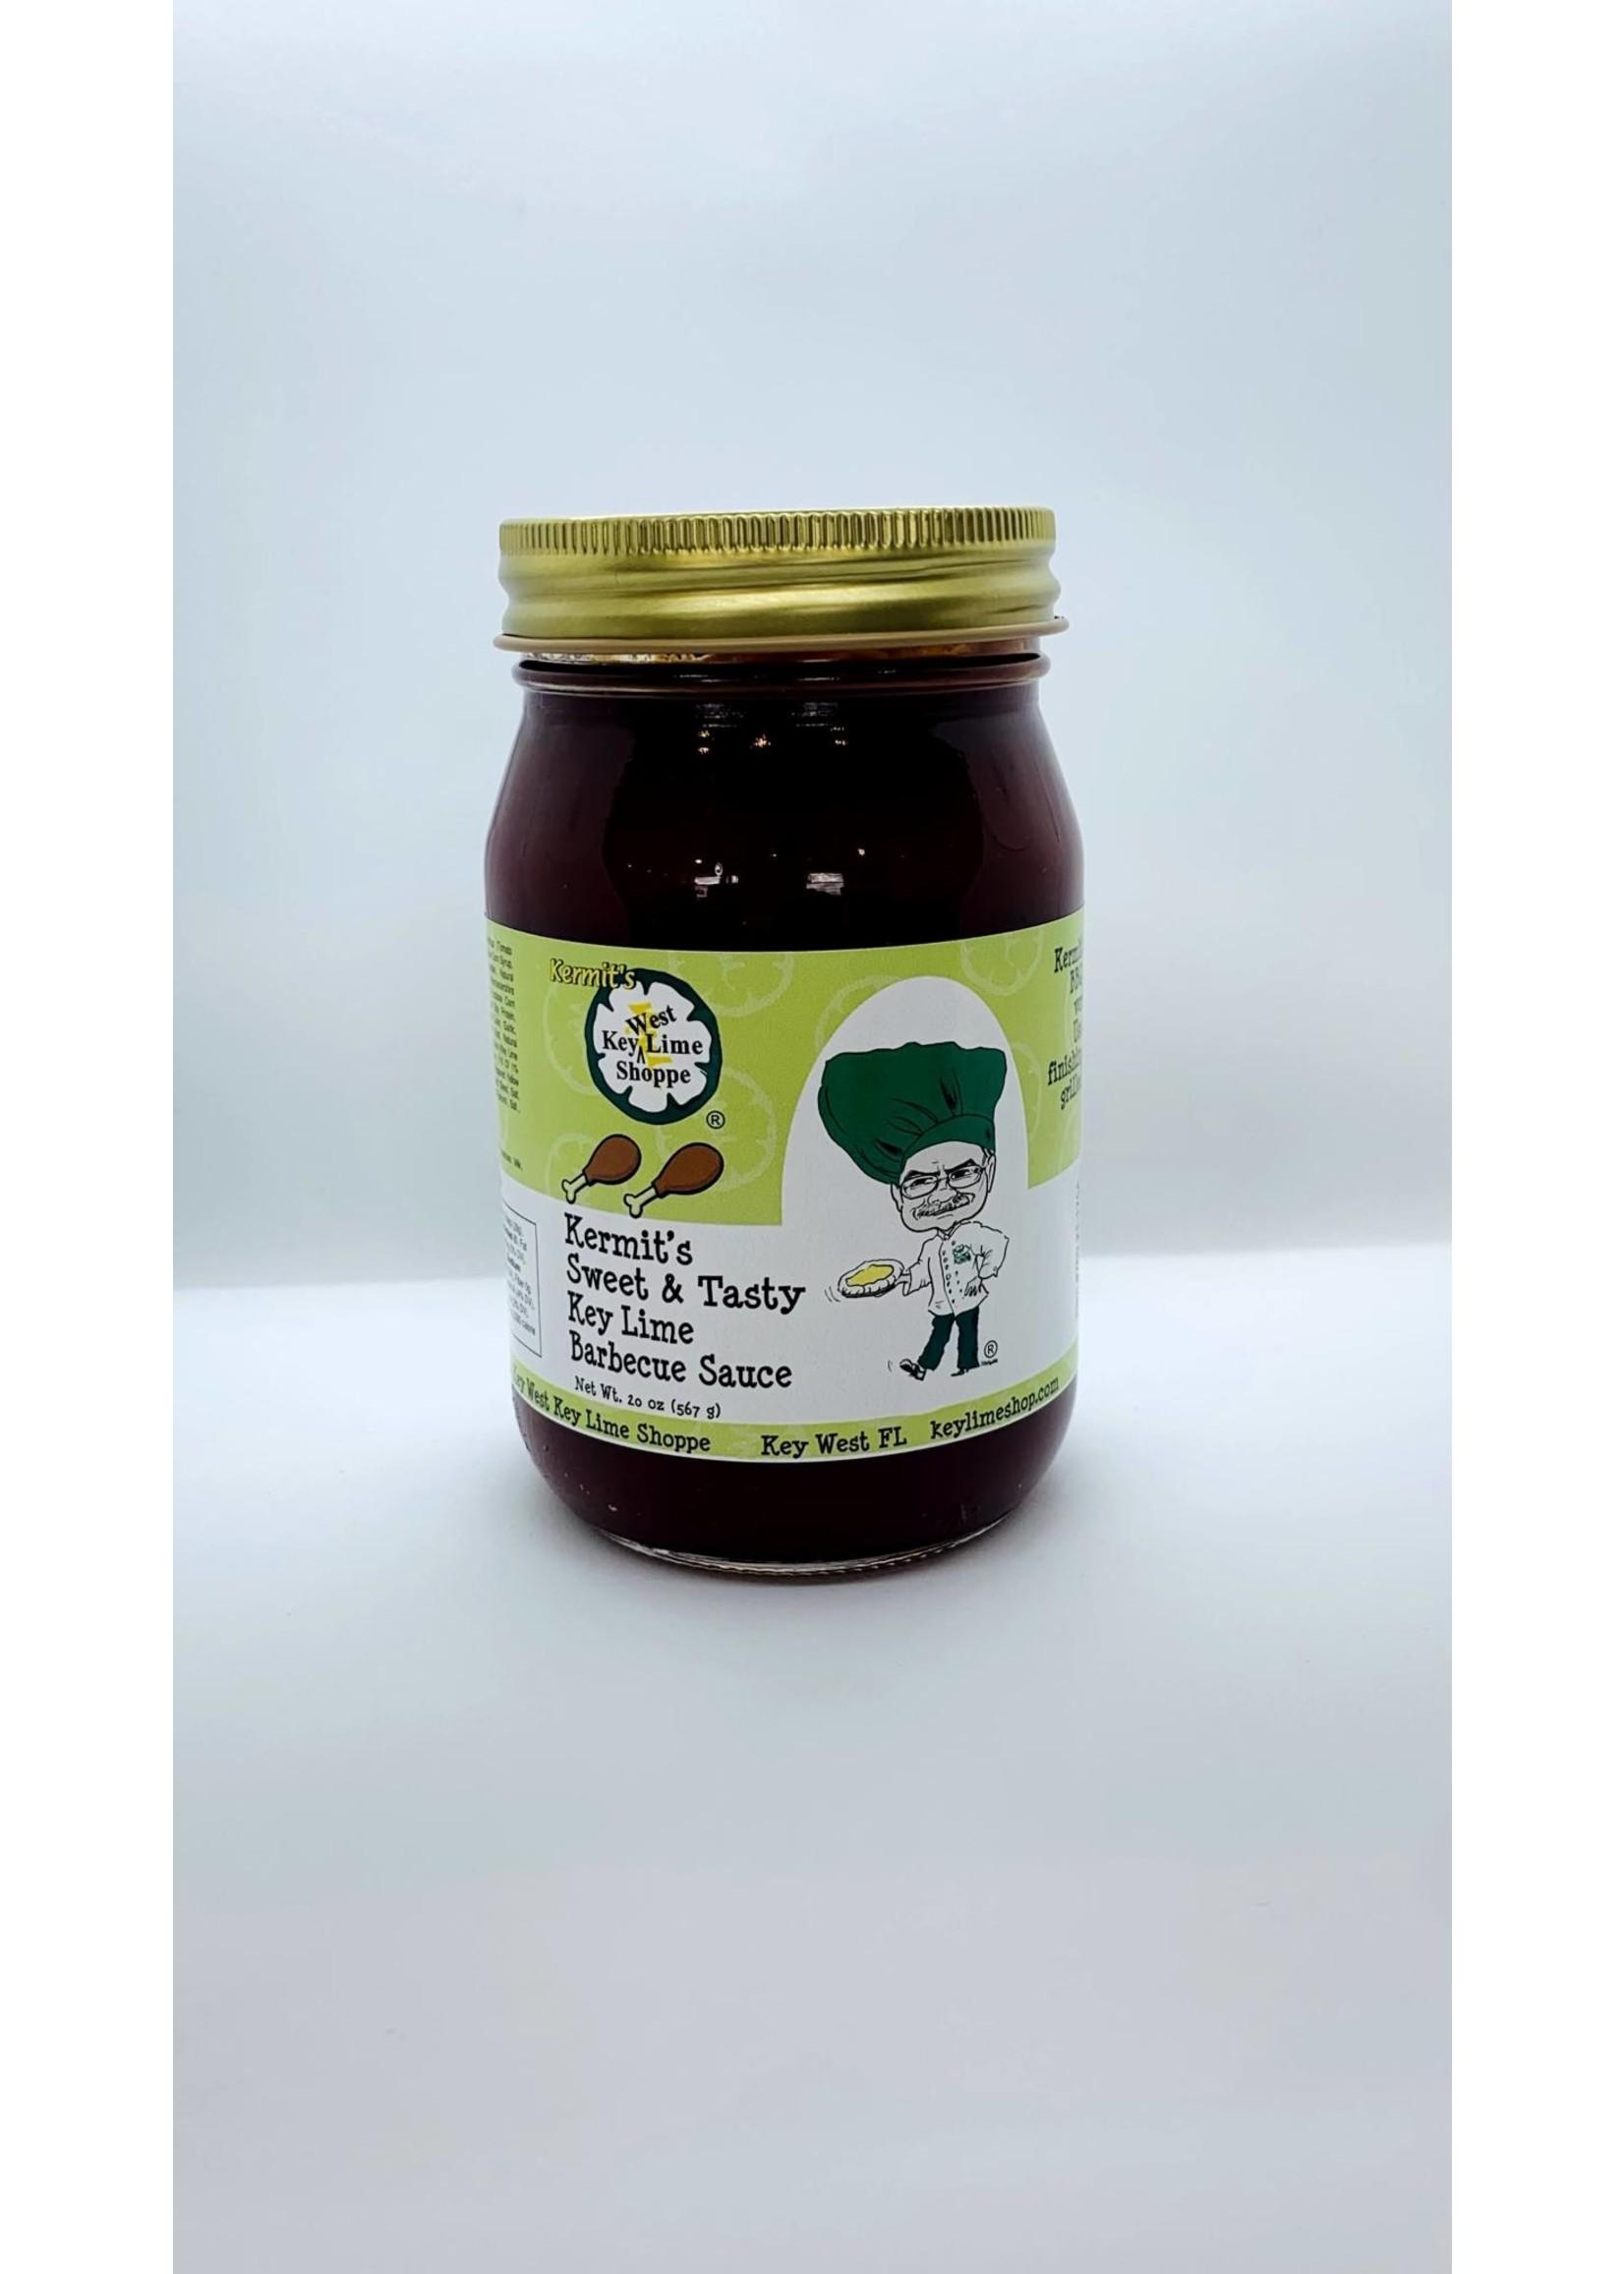 Kermit's Sweet & Tasty Key Lime Barbecue Sauce  20 oz.